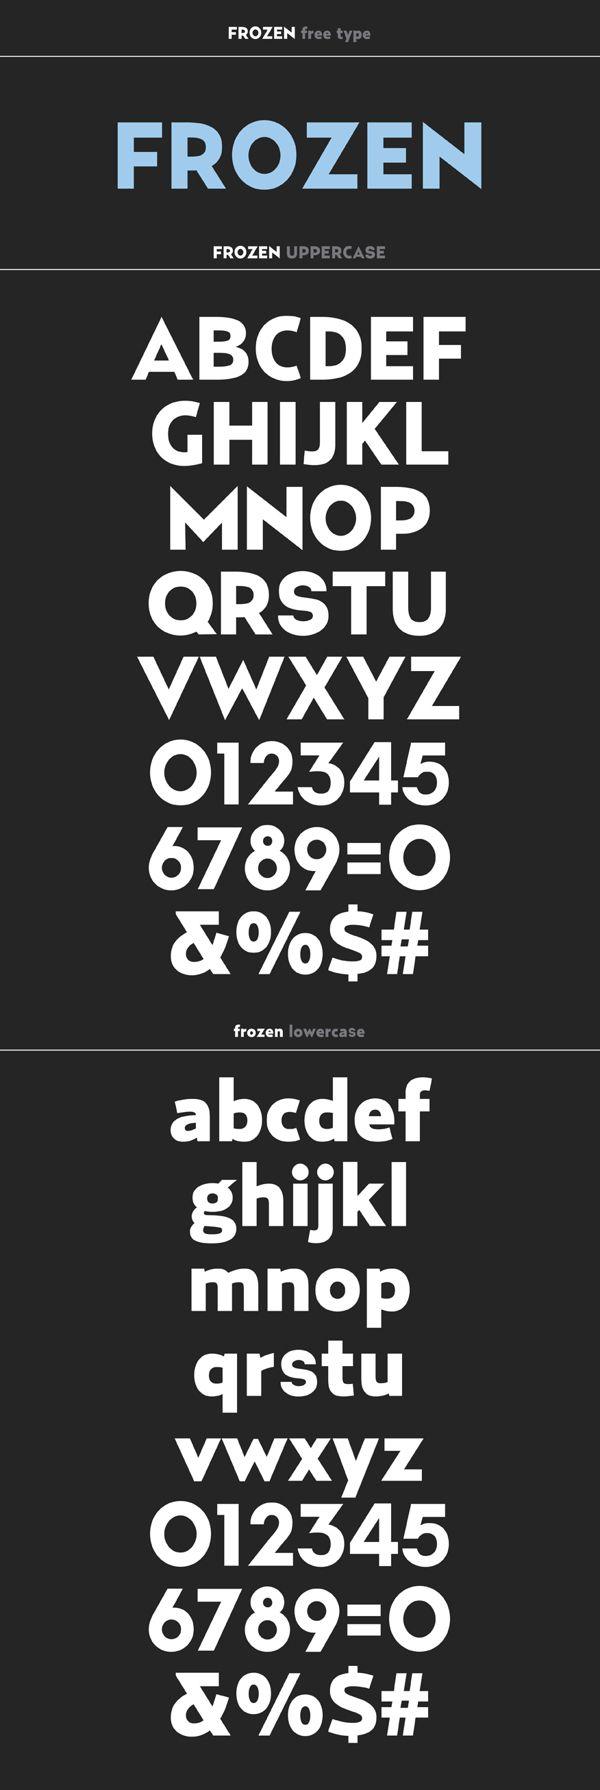 "bold type named ""Frozen"" - Frozen free type by Ricardo Veloso, via Behance"